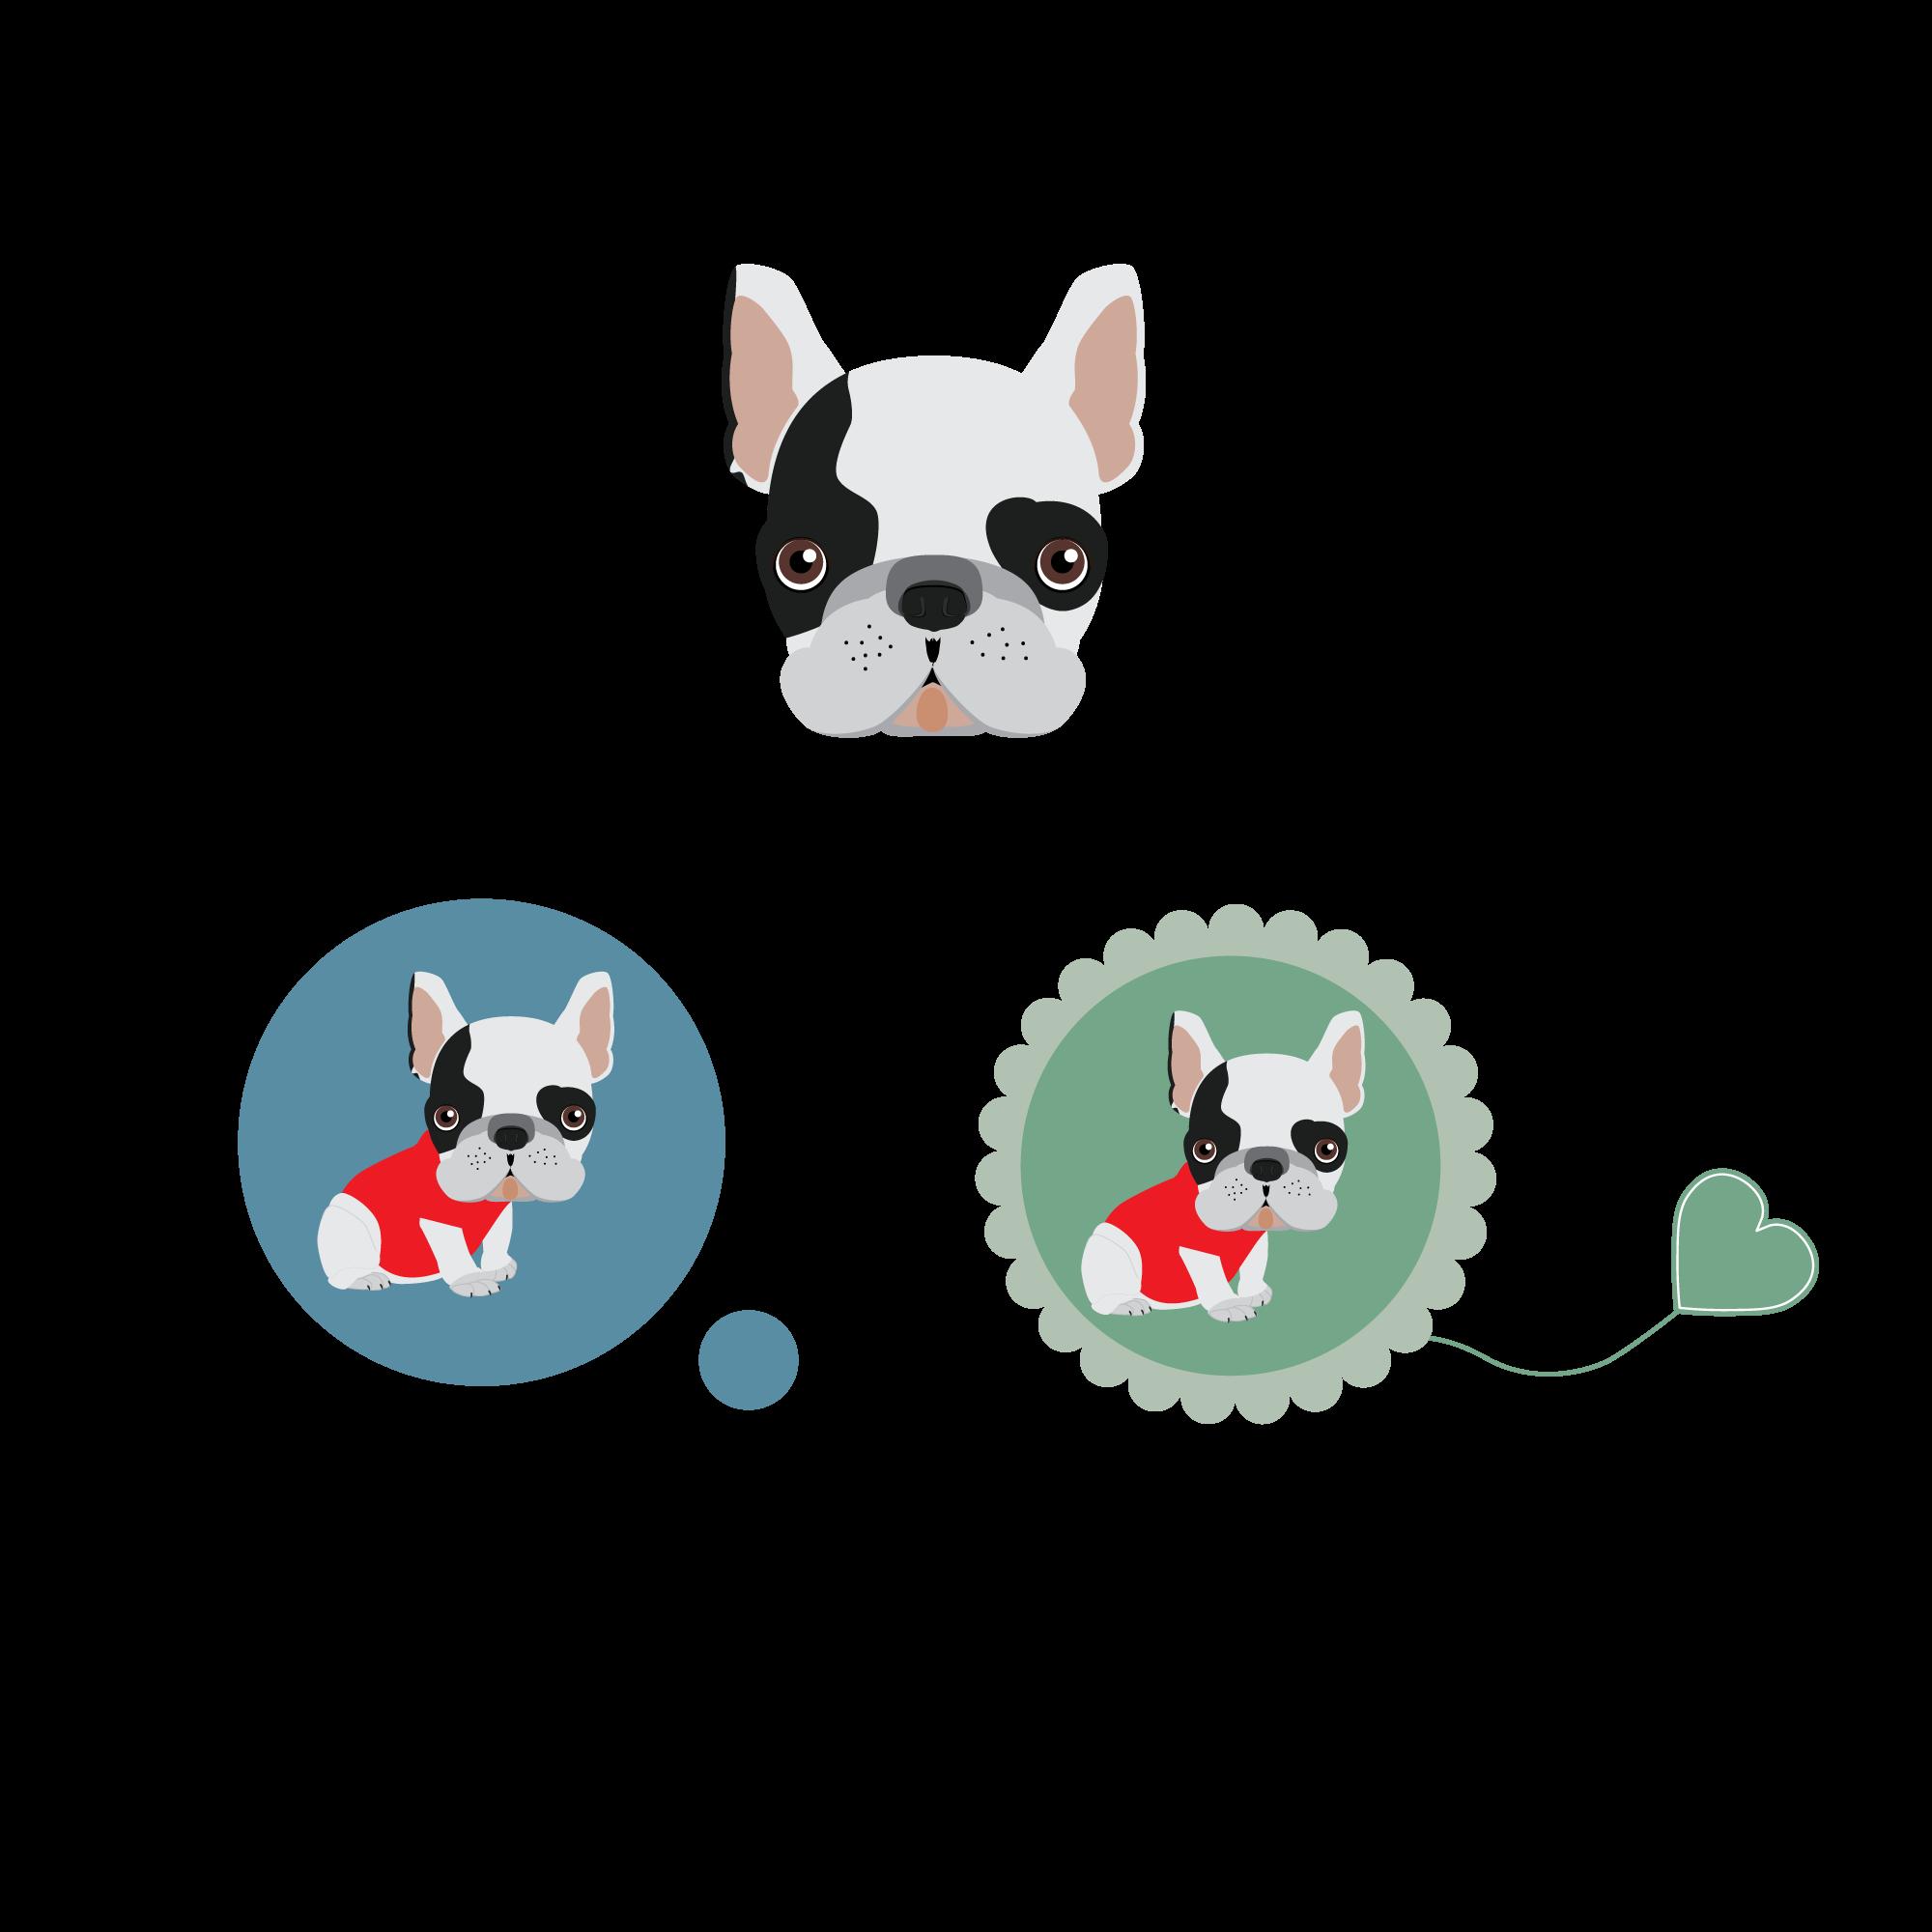 French Bulldog French Bulldog Bulldog Pup